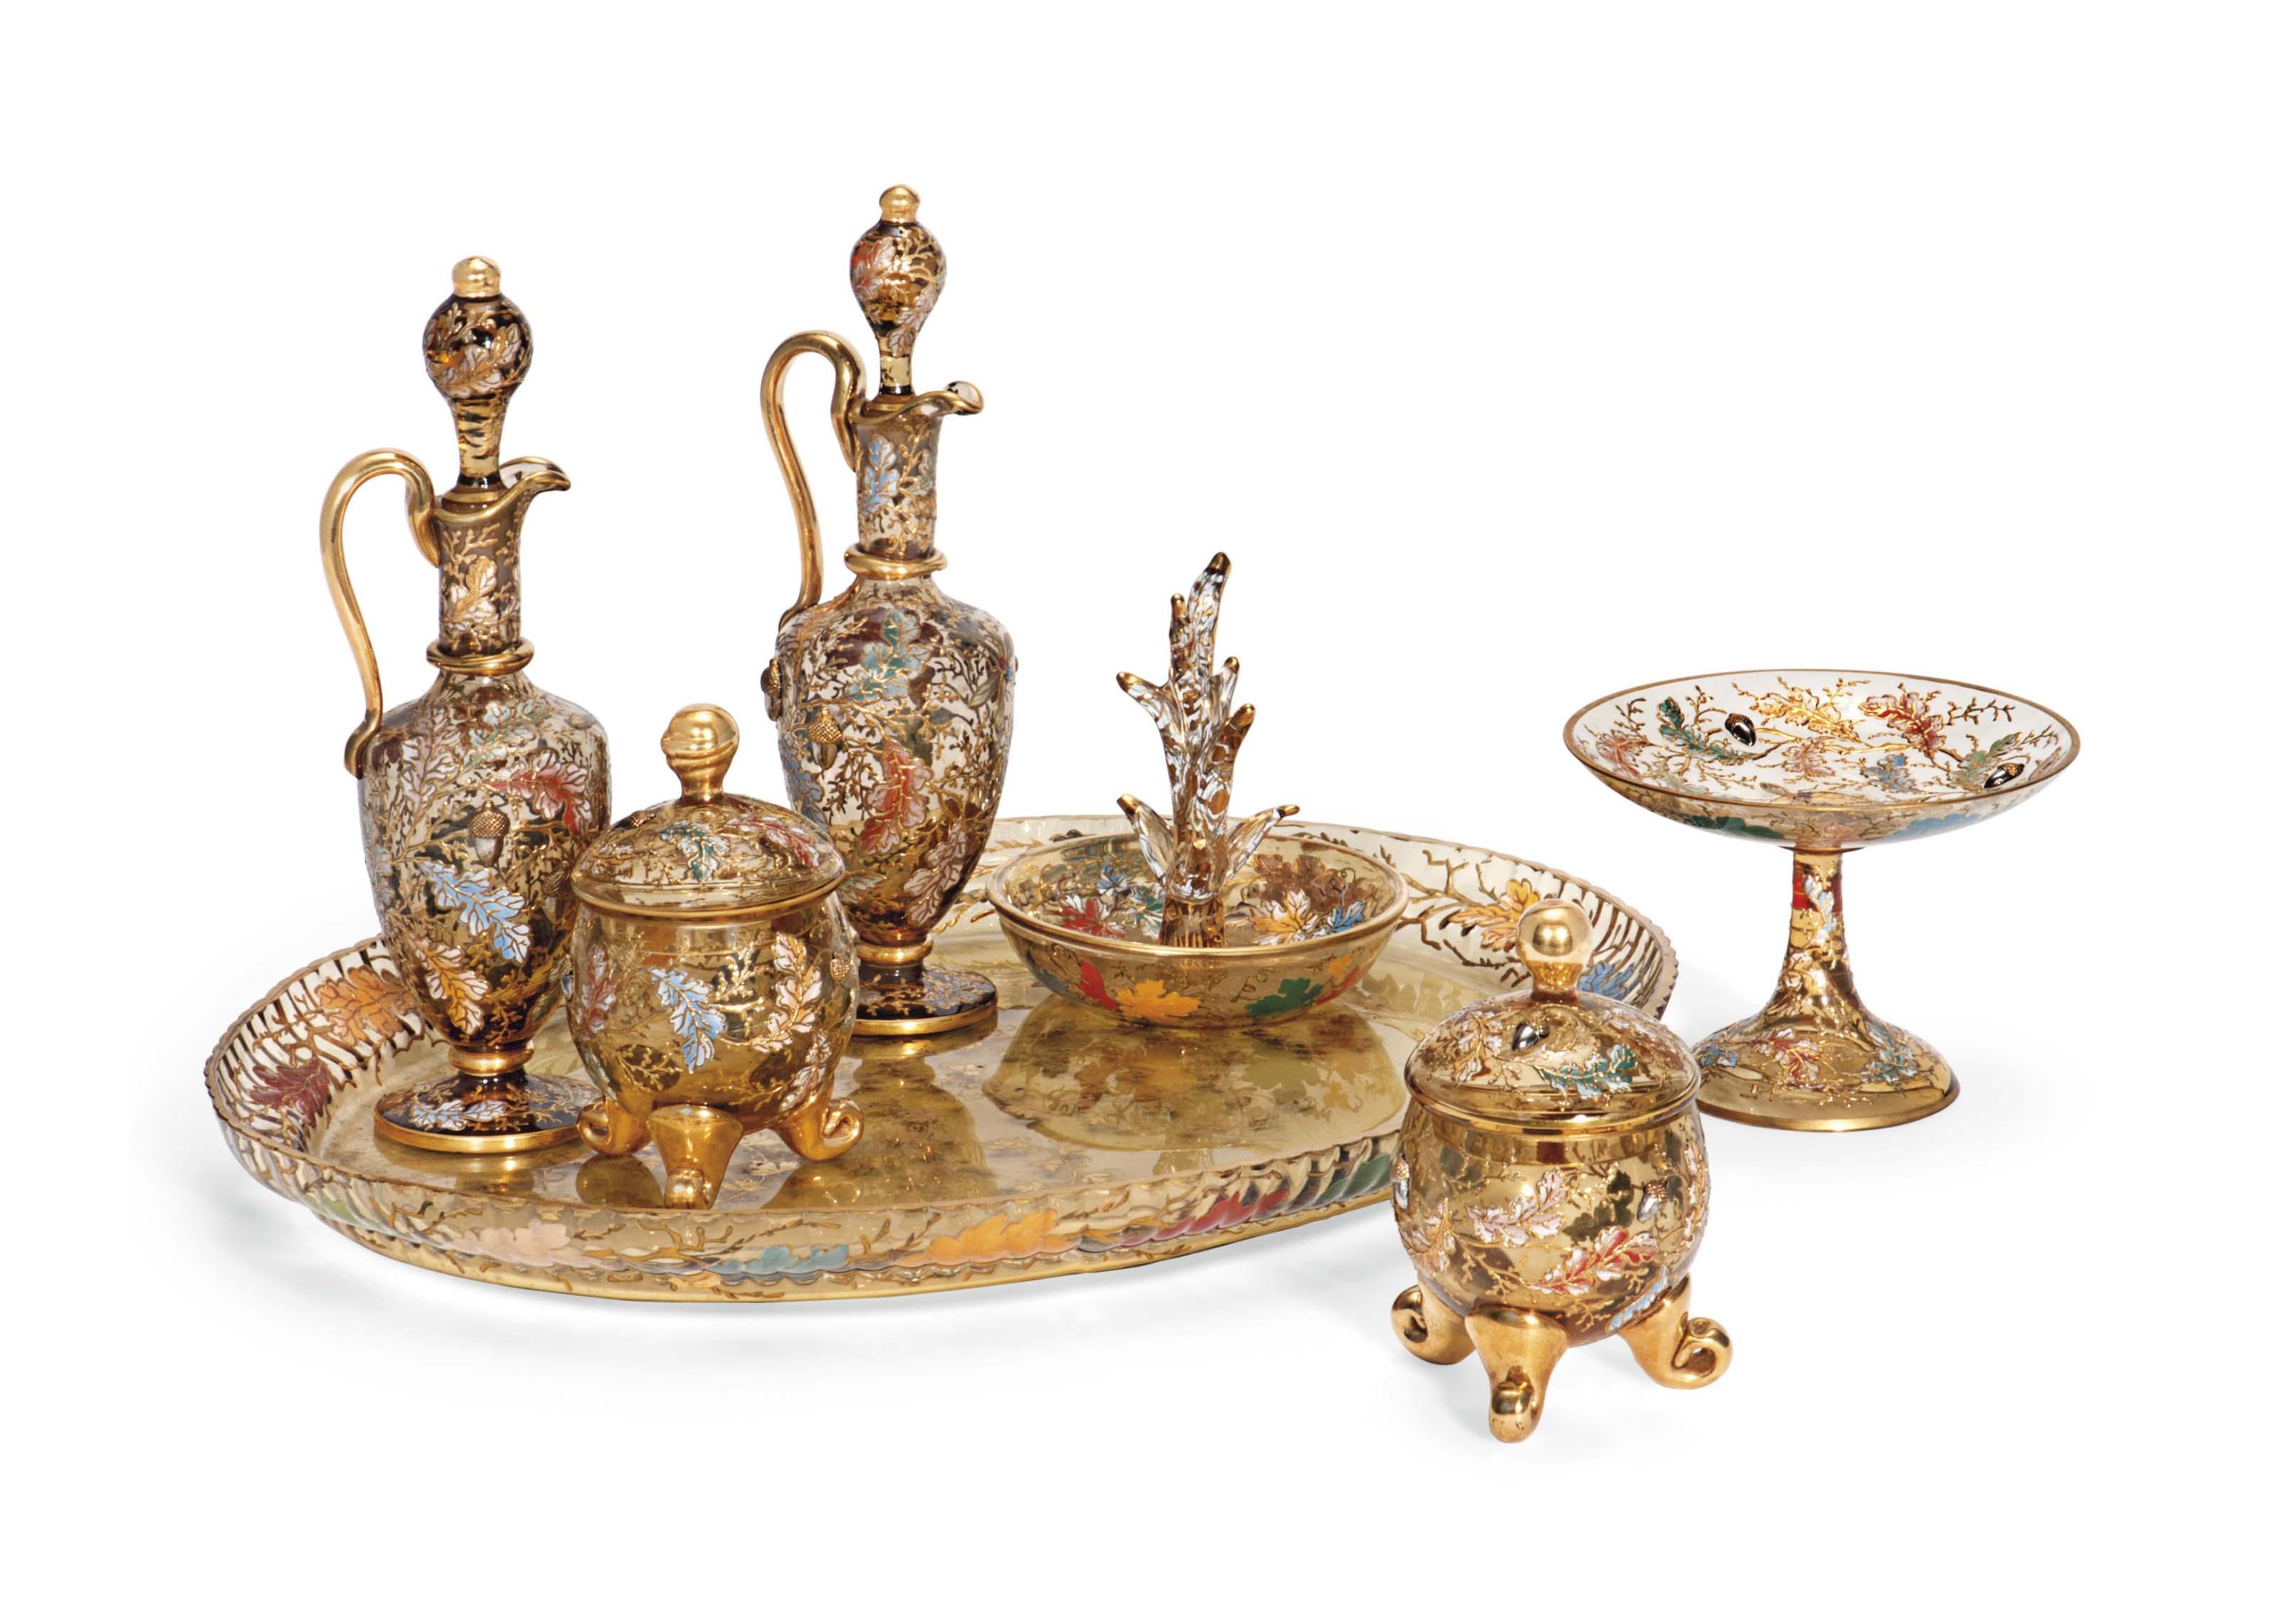 A MOSER ENAMELLED GLASS DRESSING TABLE SET